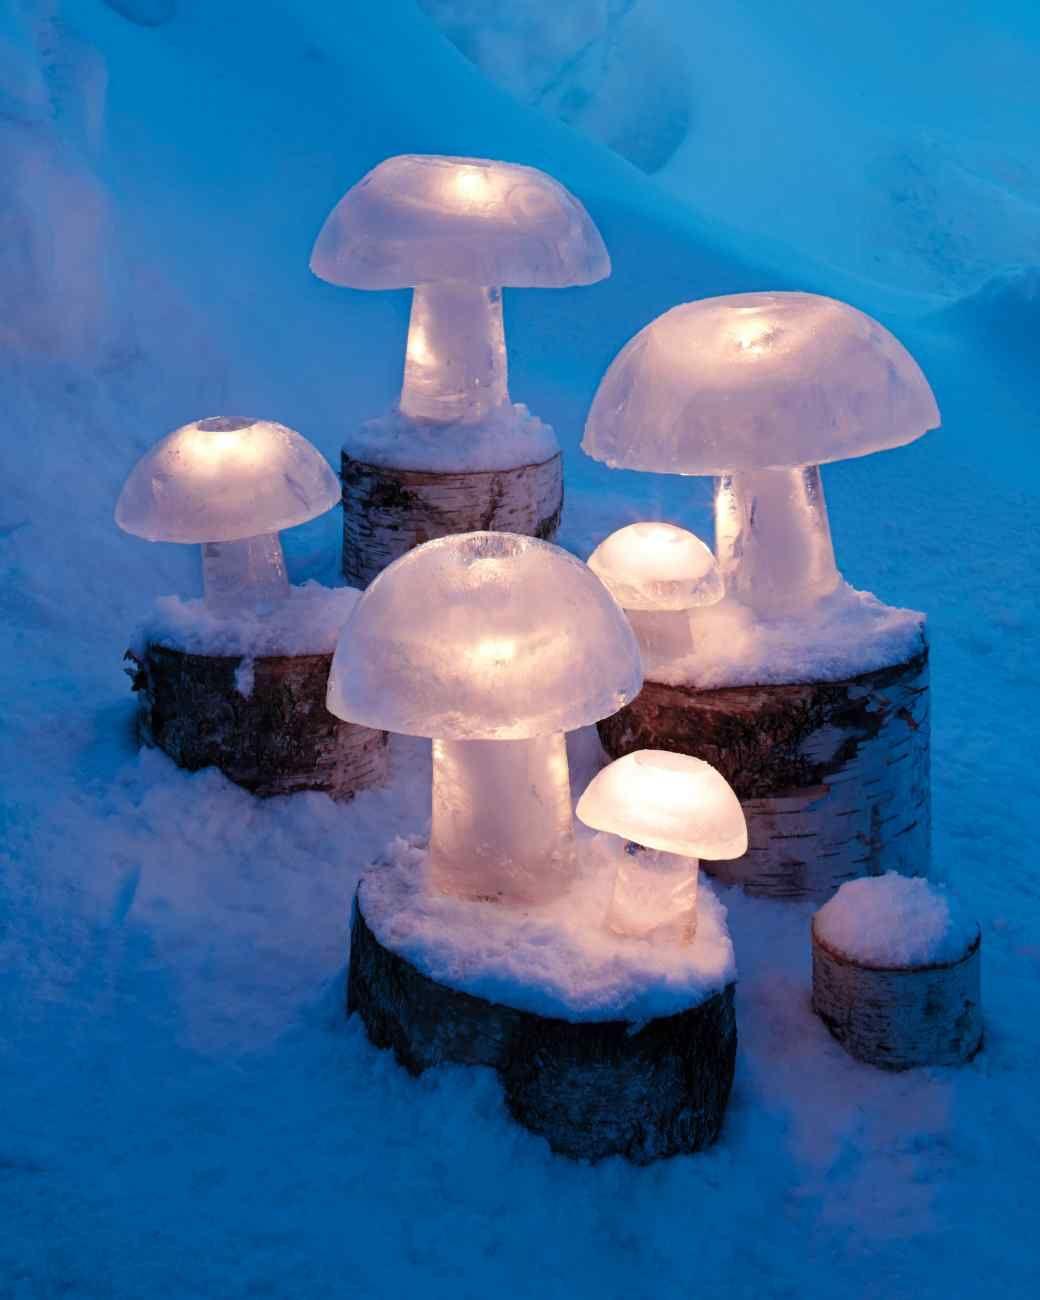 Ice Mushroom Lights Mushroom Lights Outdoor Christmas Decorations Ice Candle